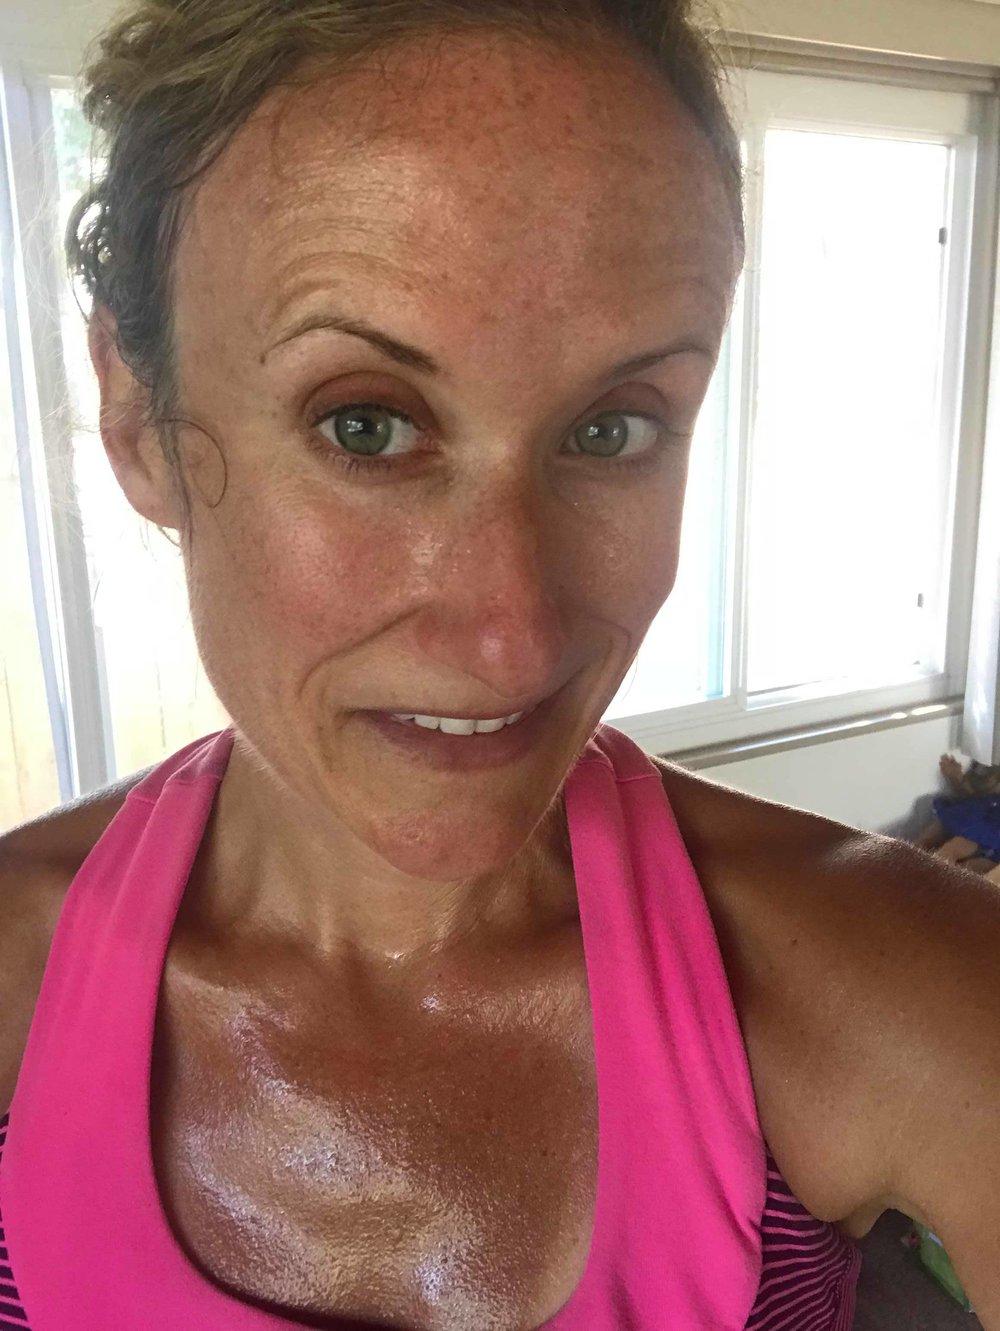 LIIFT4 | Week 4 | Day 3 | SHOULDERS (LIIFT Intervals) — Stephanie